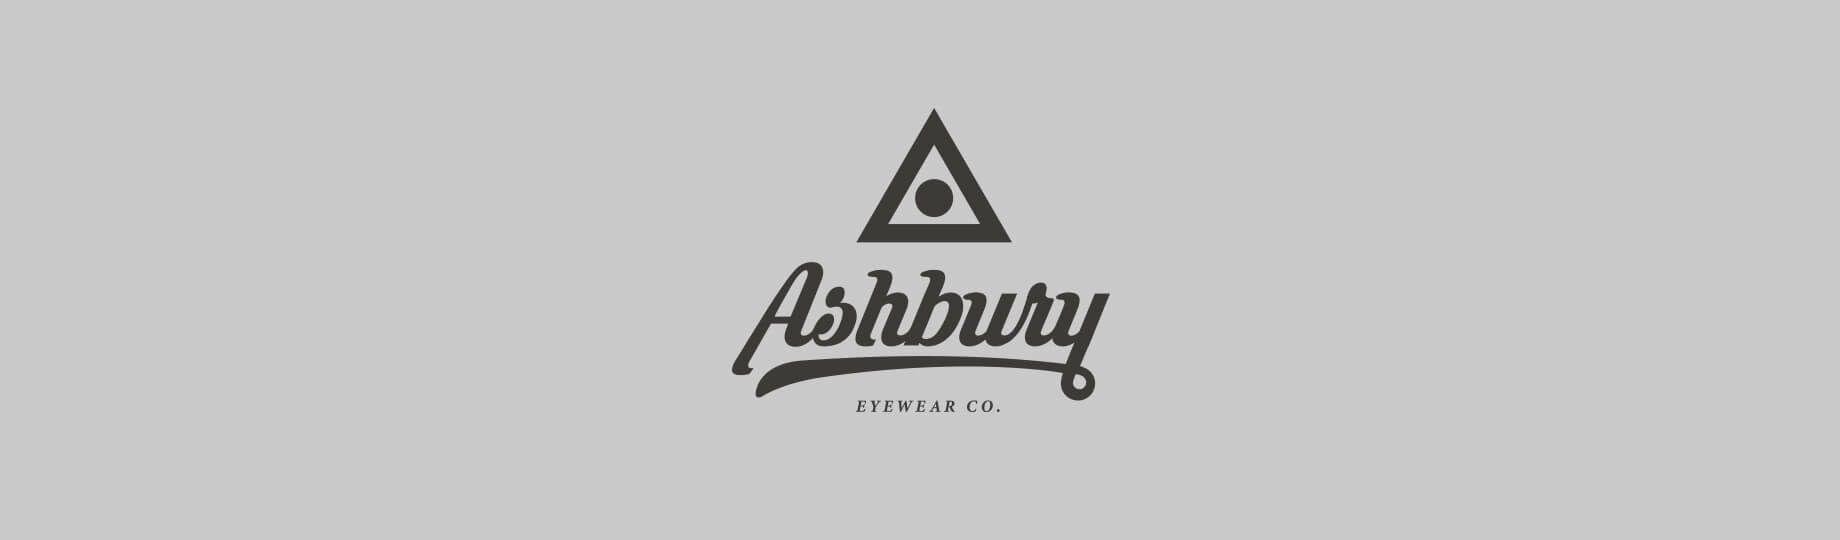 ASHBURYメイン画像